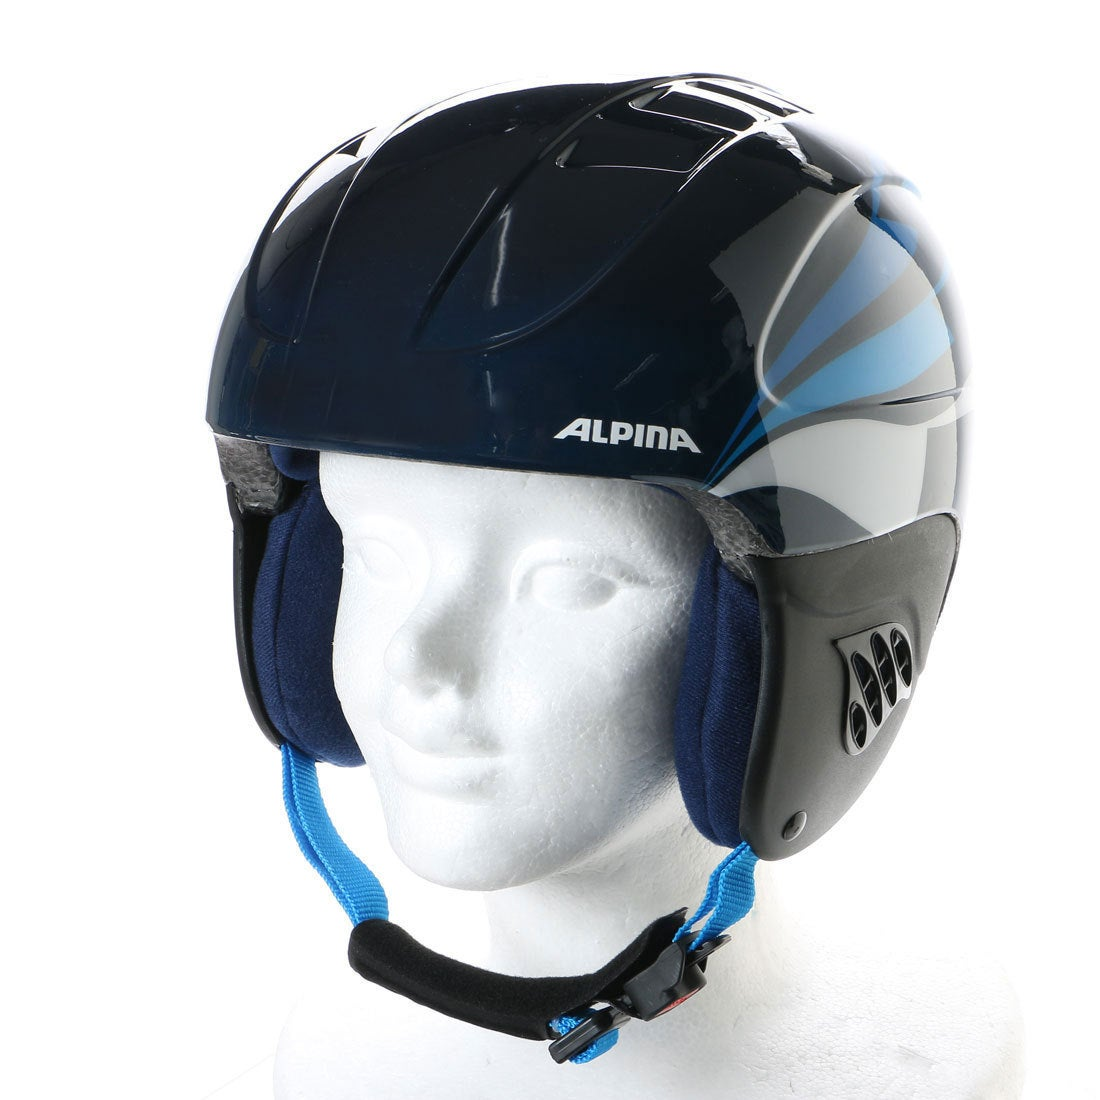 【SALE 20%OFF】ウベックス UVEX ジュニア スキー/スノーボード ヘルメット CARATNBL 208